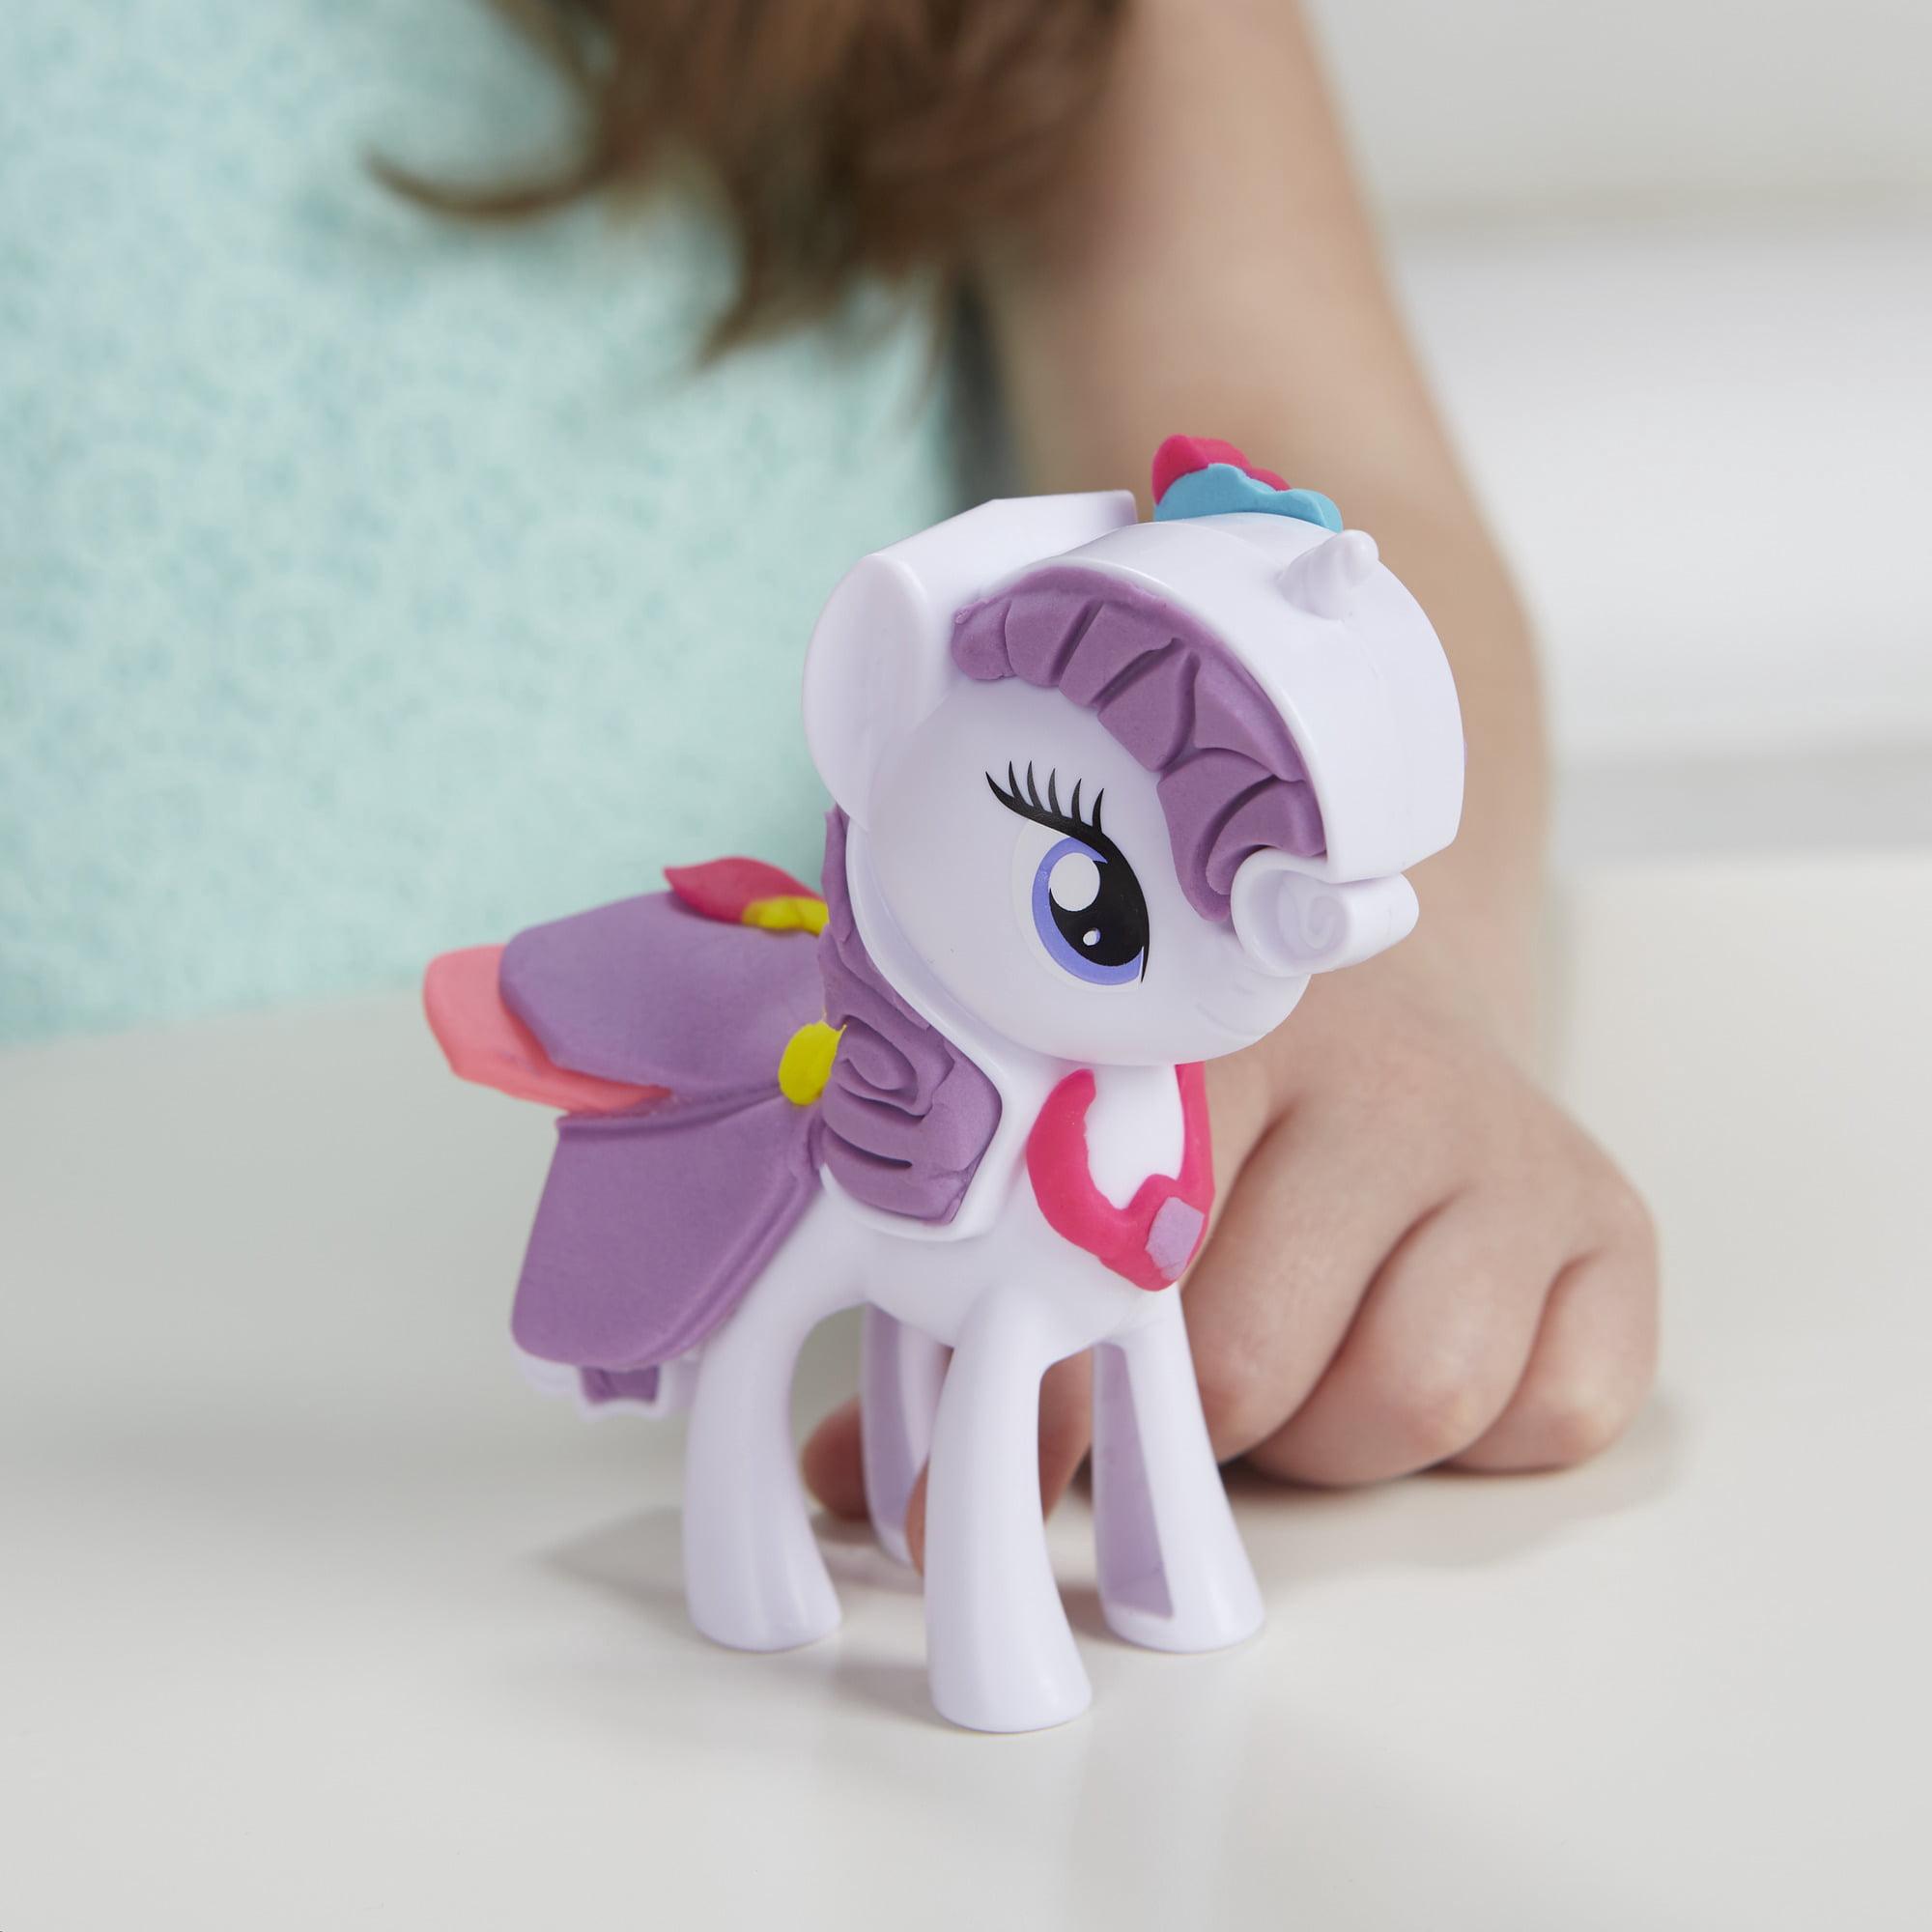 Buy Play Doh My Little Pony Princess Twilight Sparkle And Rarity